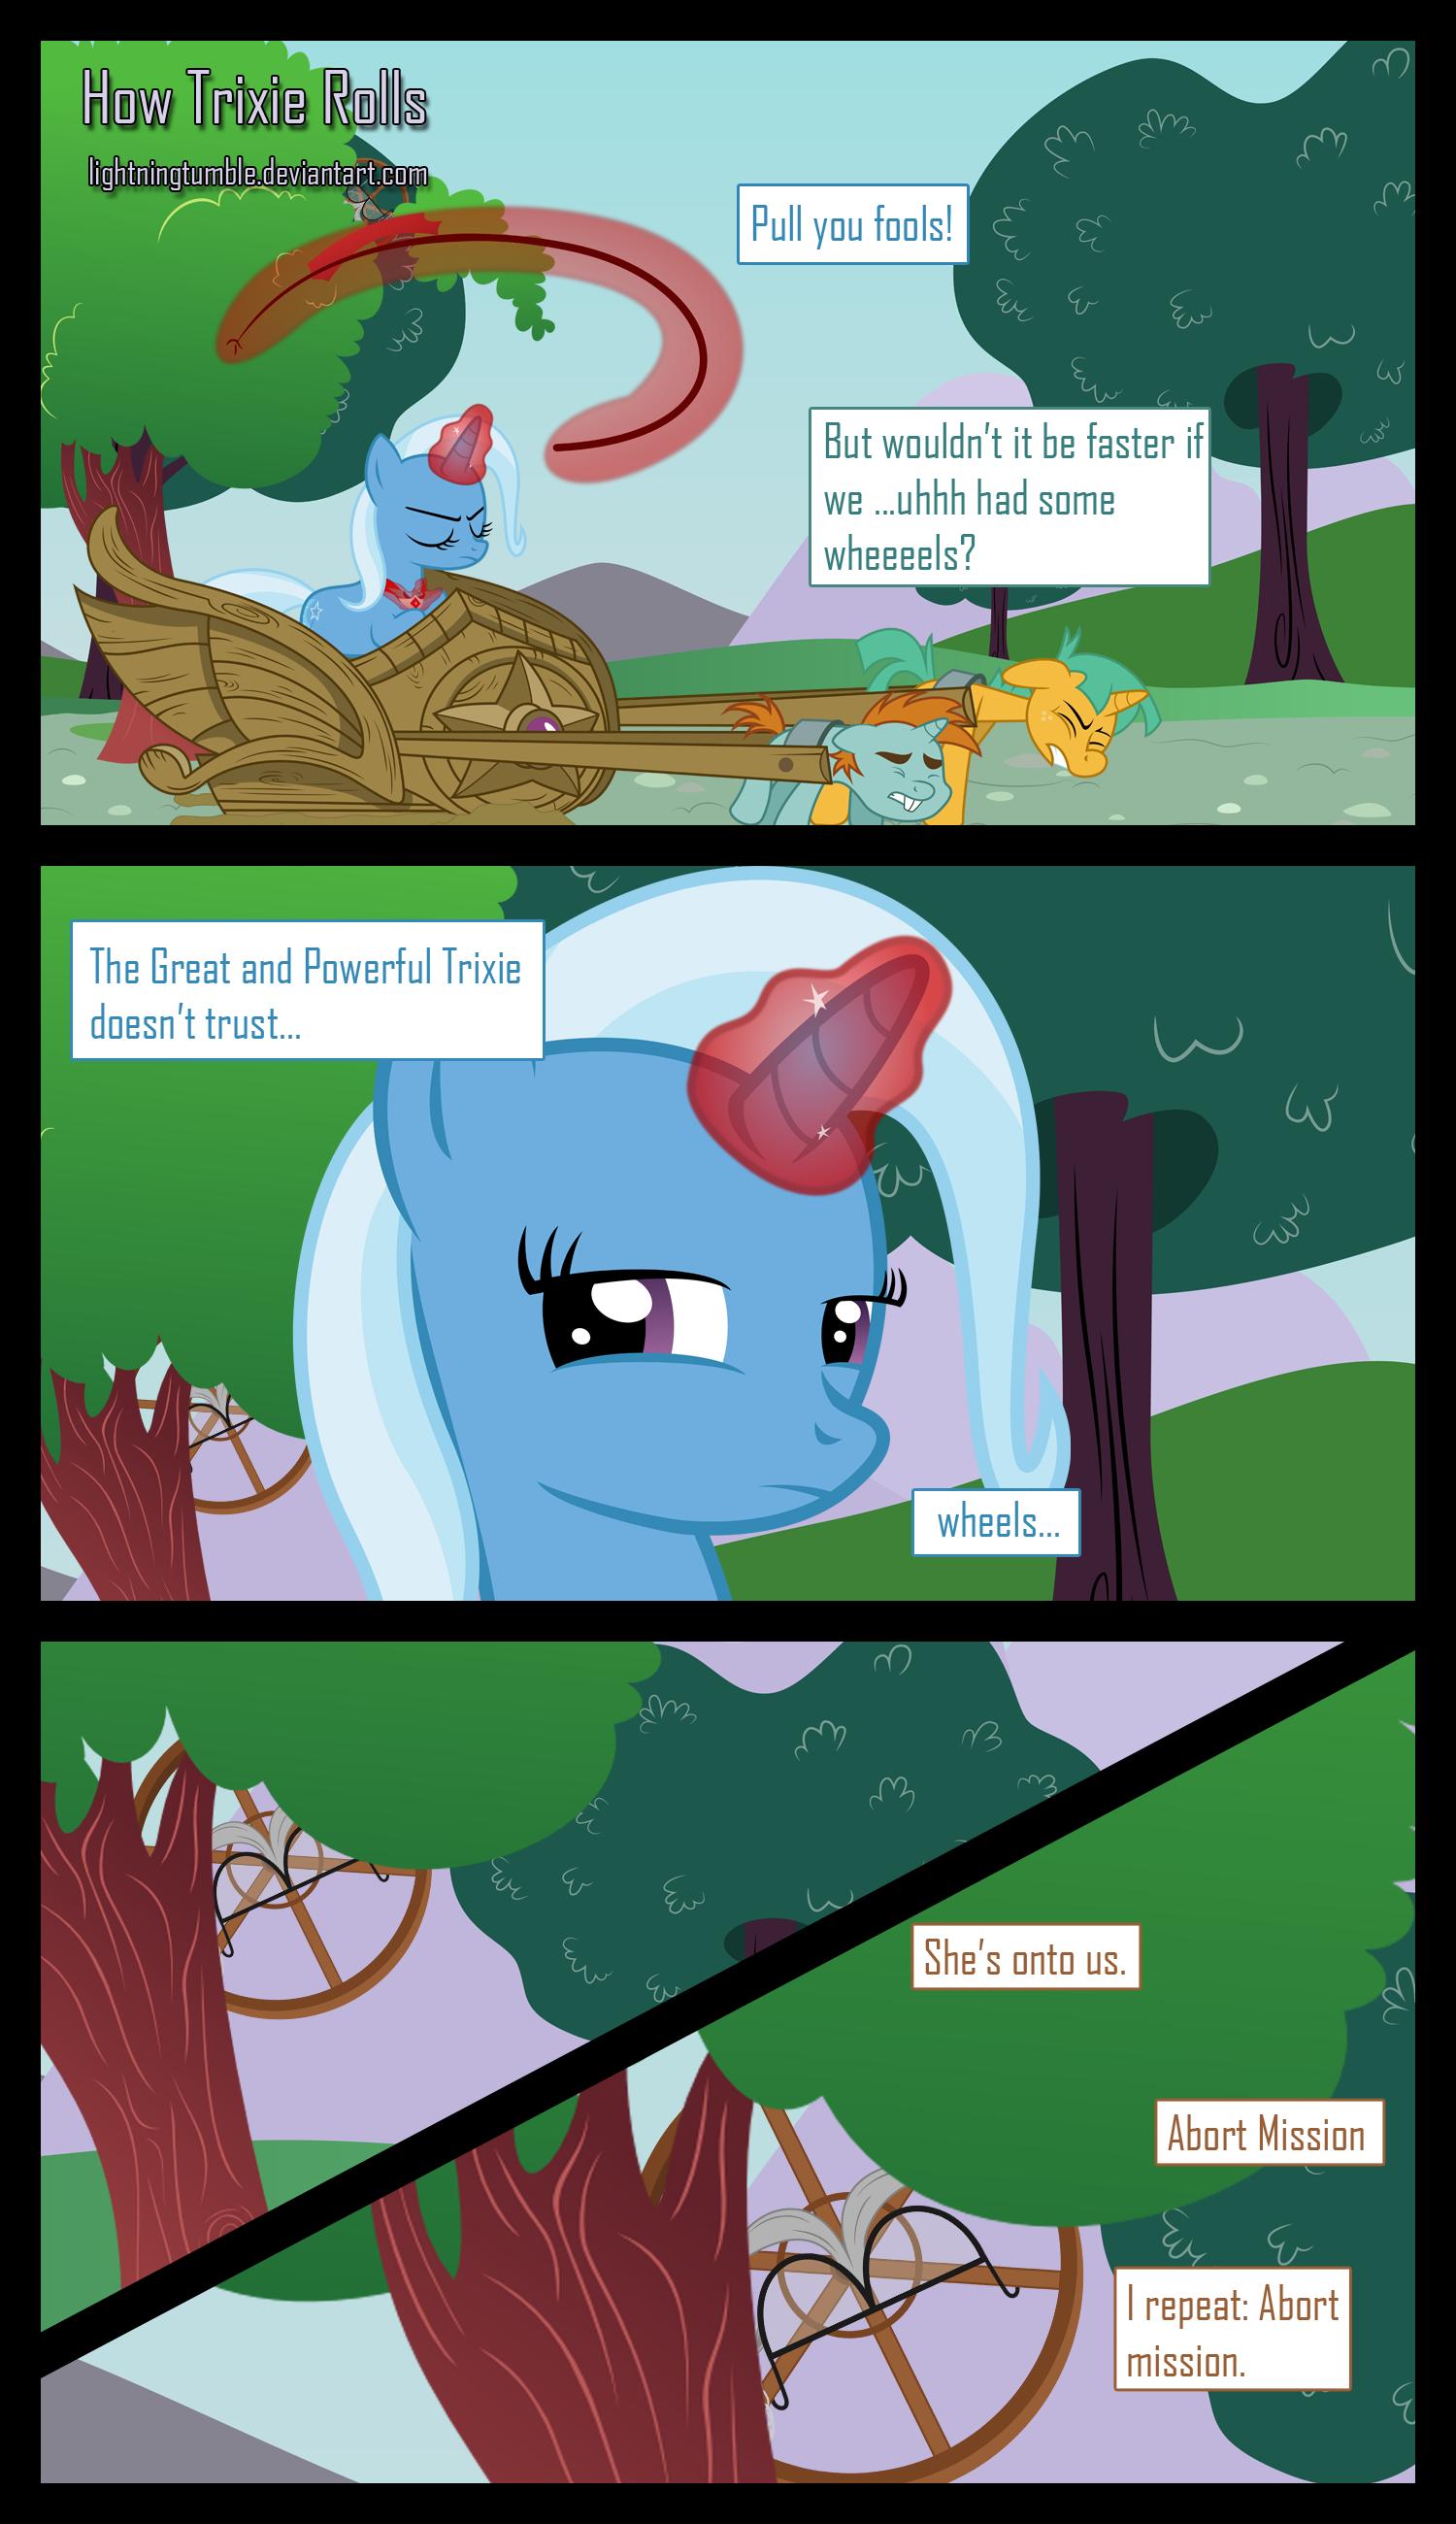 How Trixie Rolls by lightningtumble